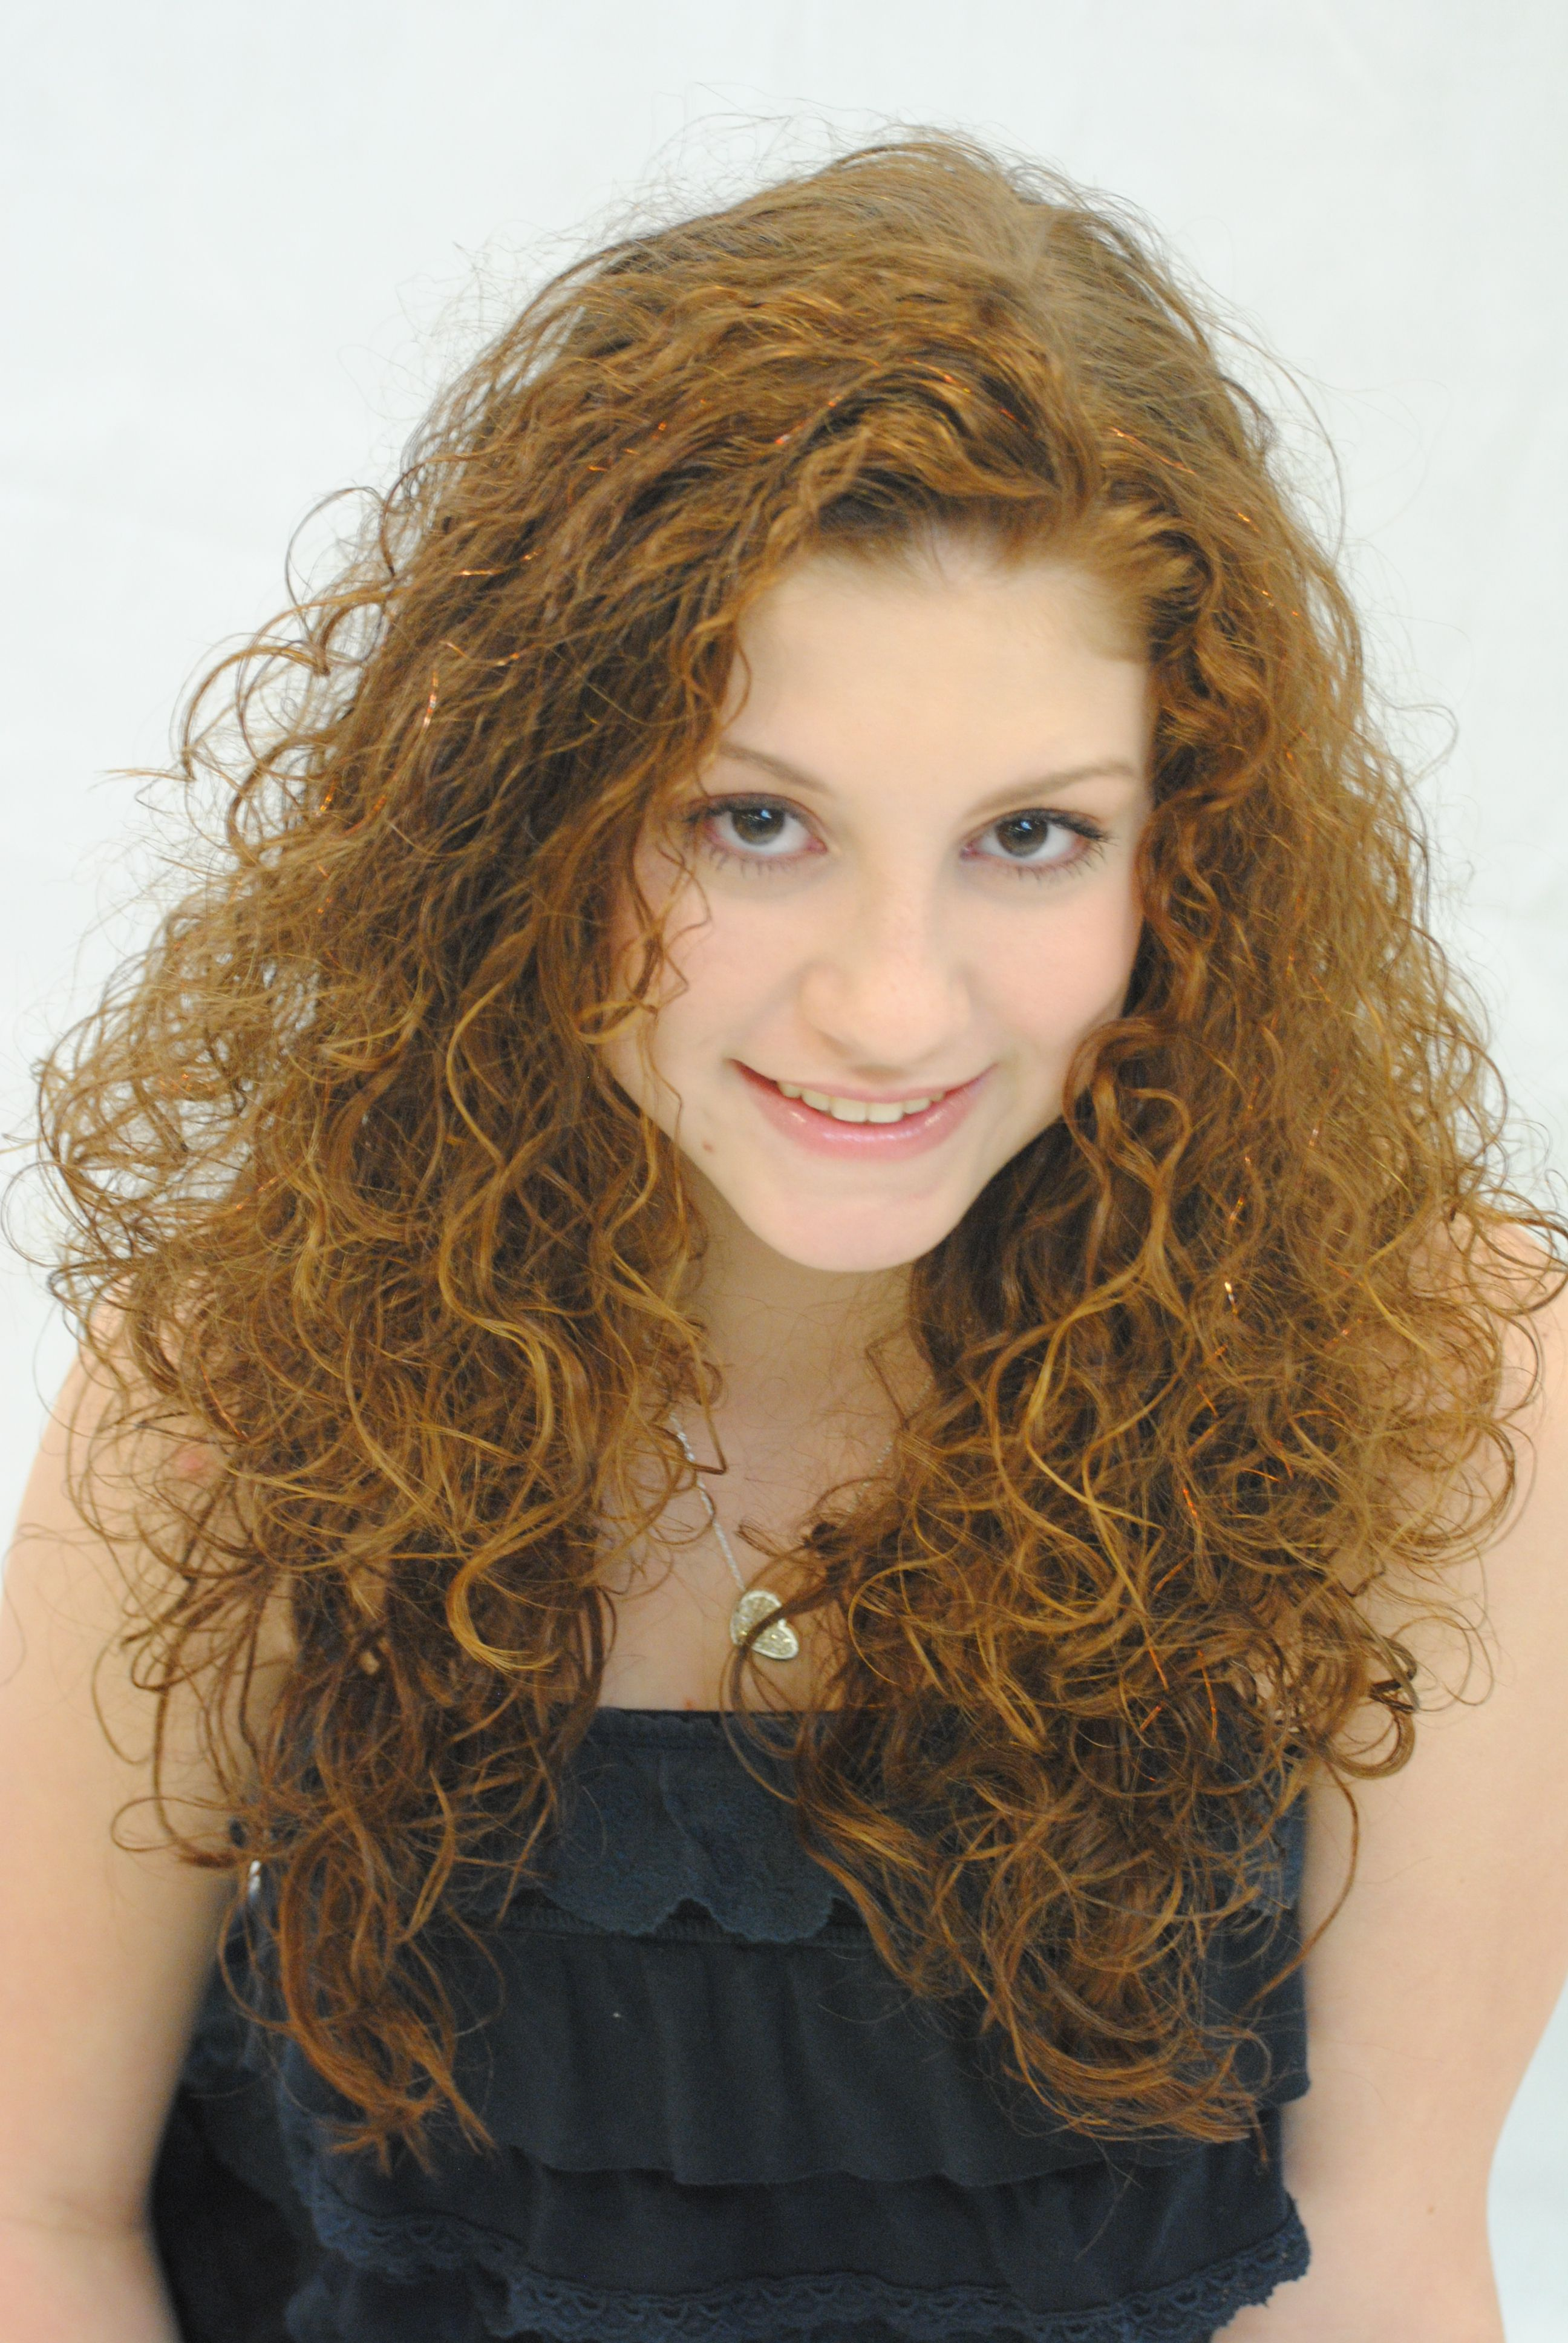 Teenage Hairstyling dj's Style Salon, Cincinnati, Ohio